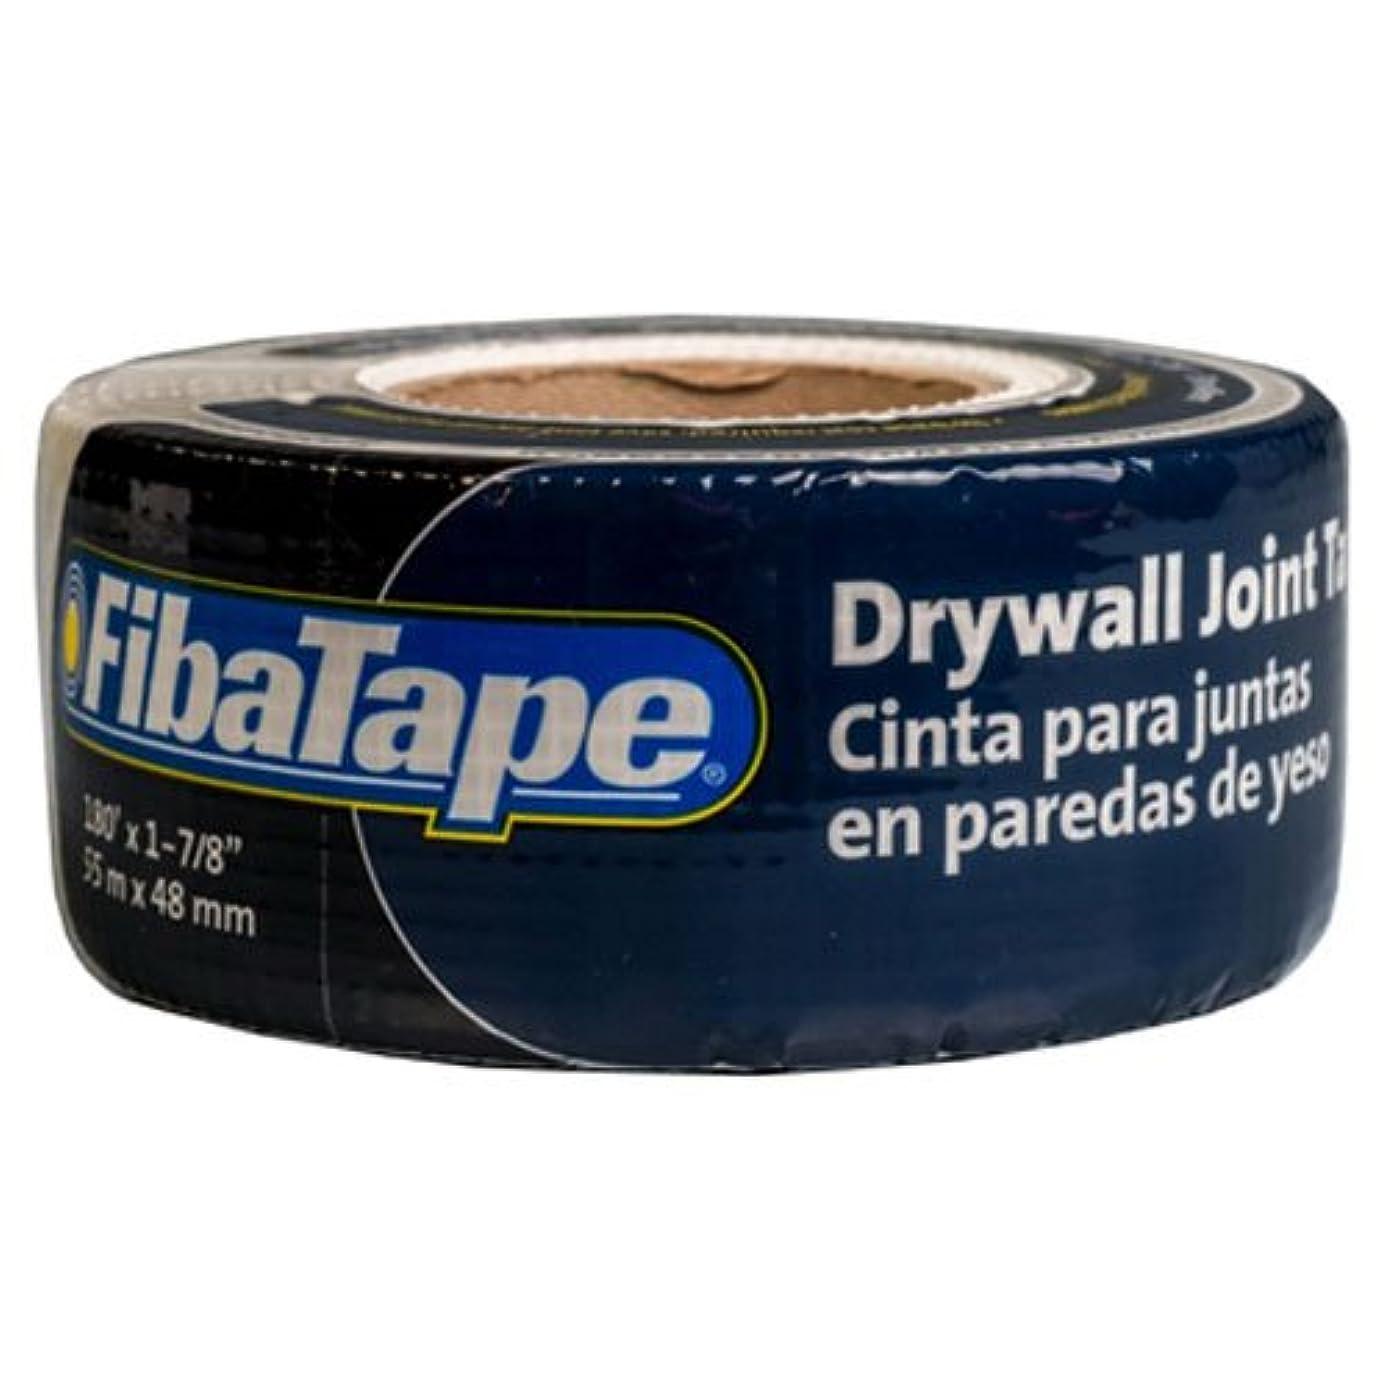 Saint-Gobain ADFORS FDW6707-U FibaTape Drywall Joint Tape, 1-7/8-Inch x 150-Feet, White